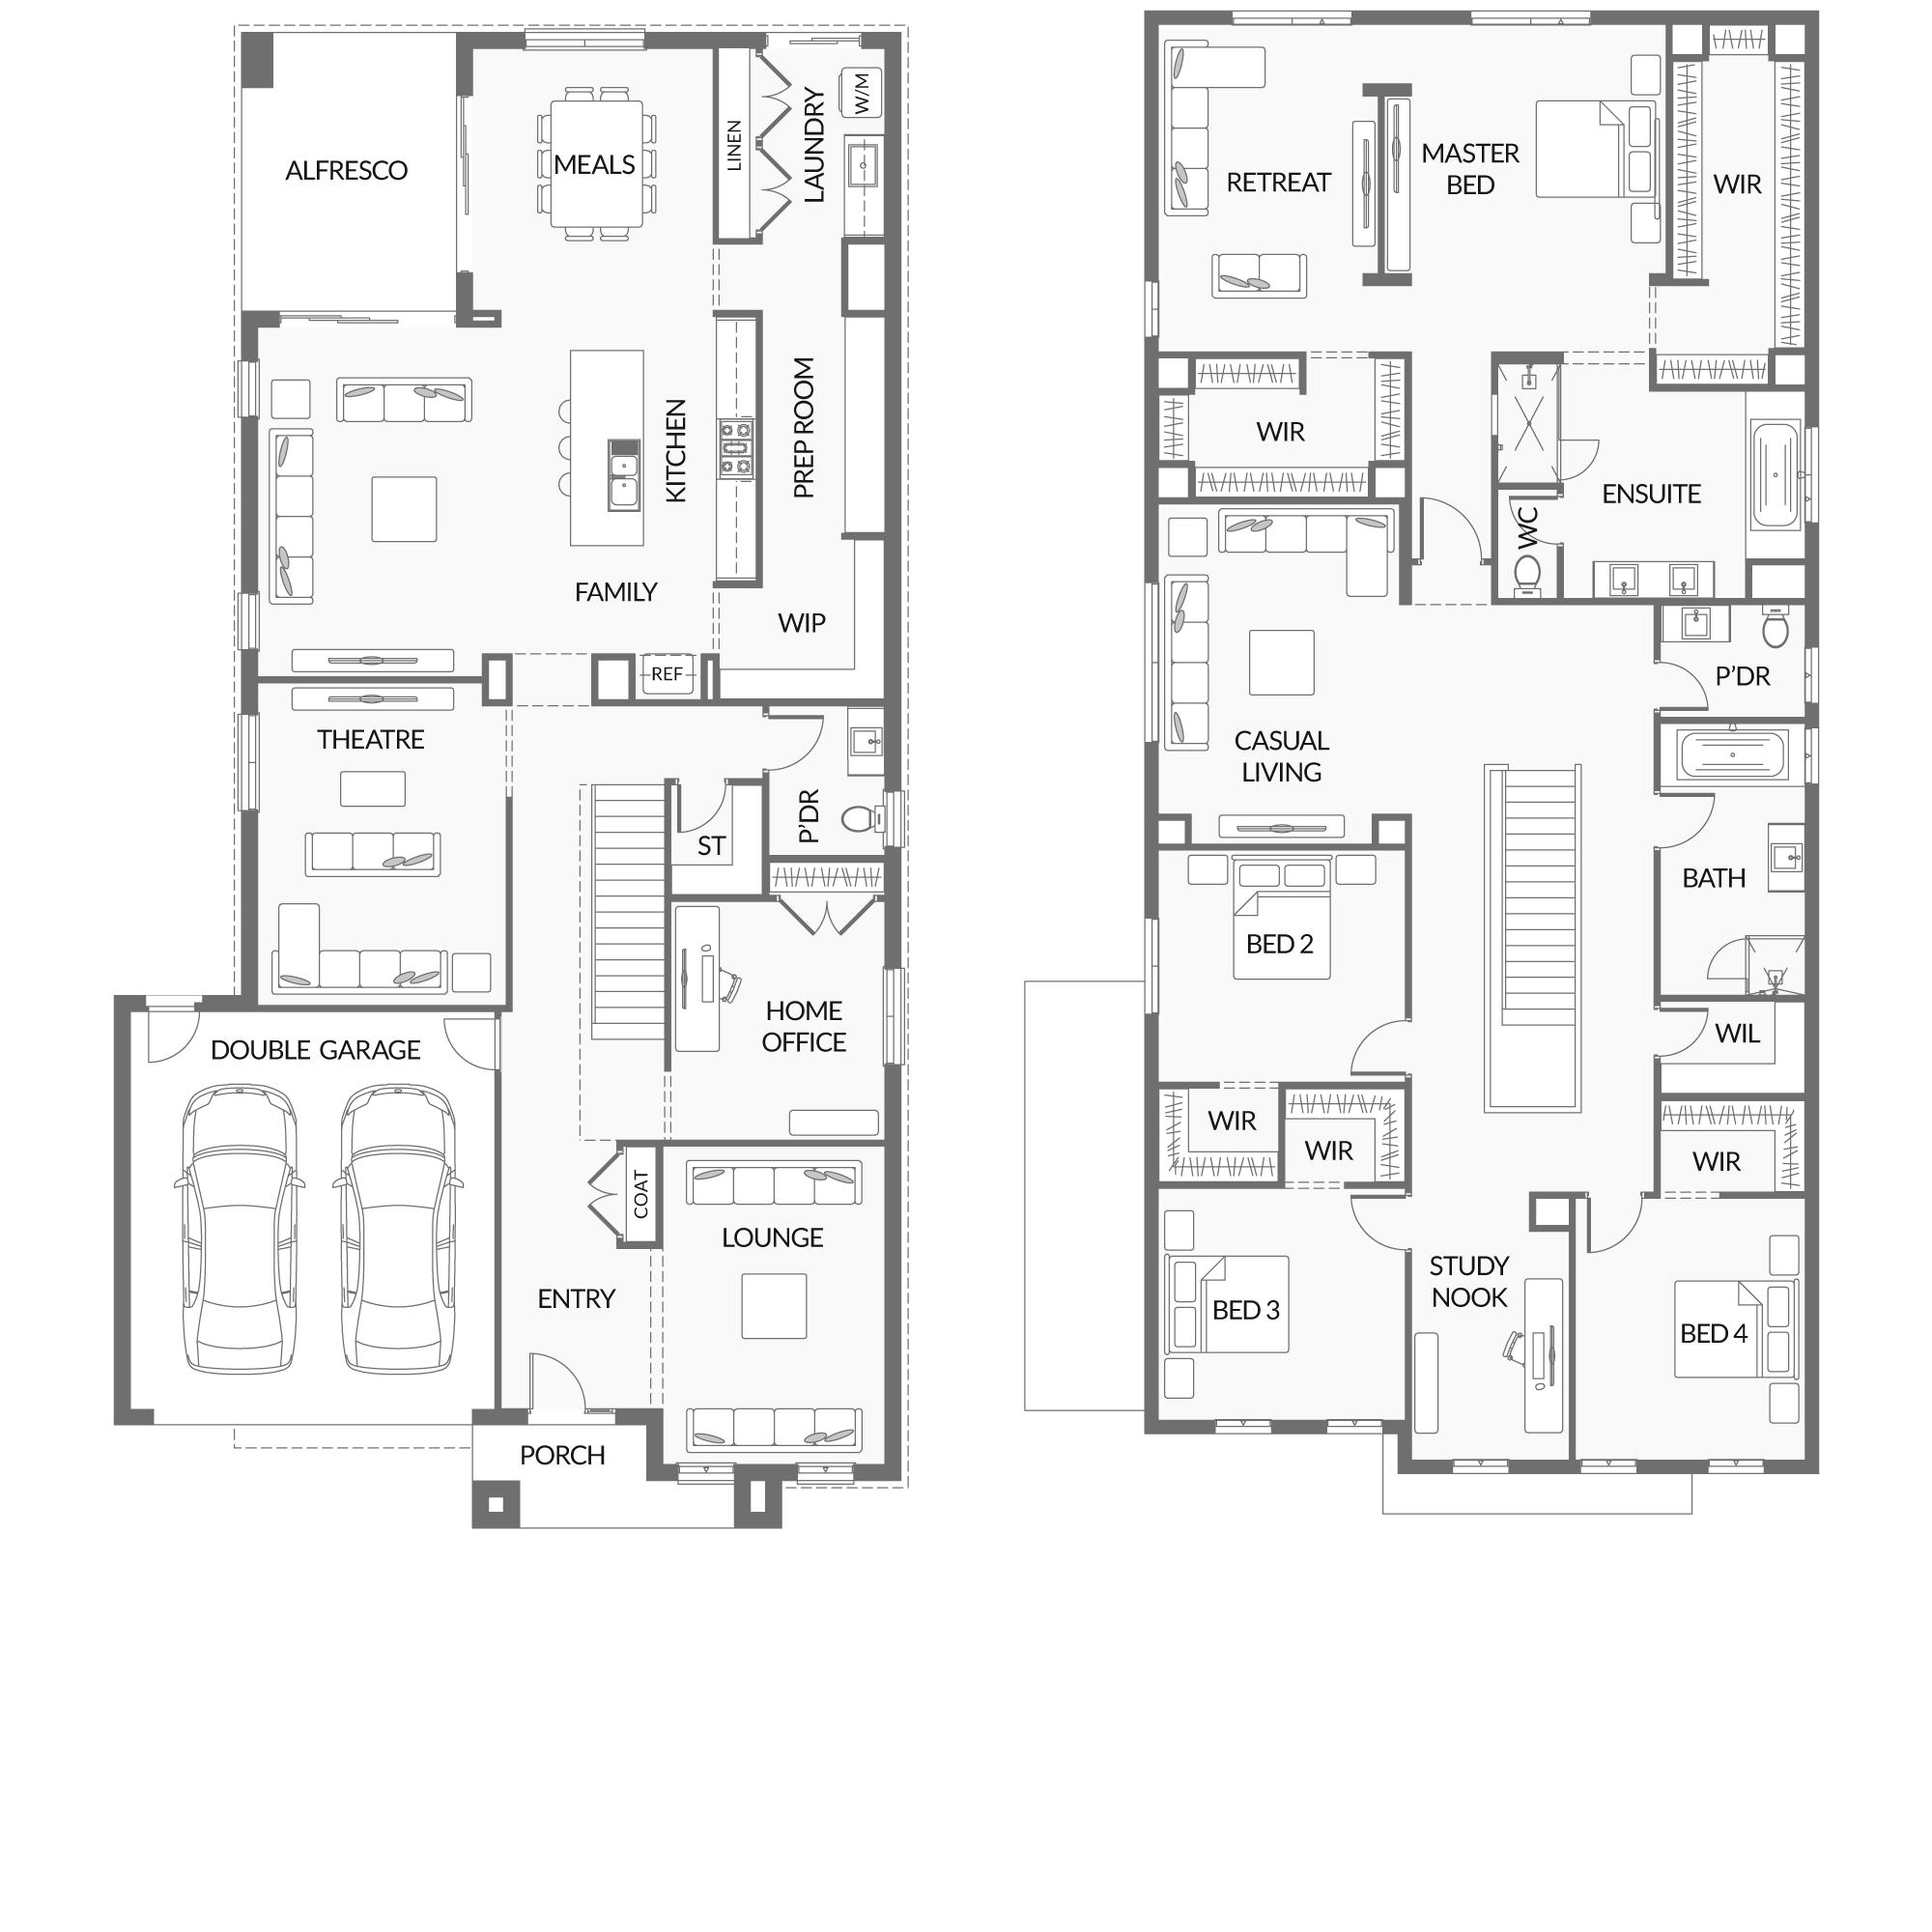 Pin by Rebecca Darke on Home designs House design